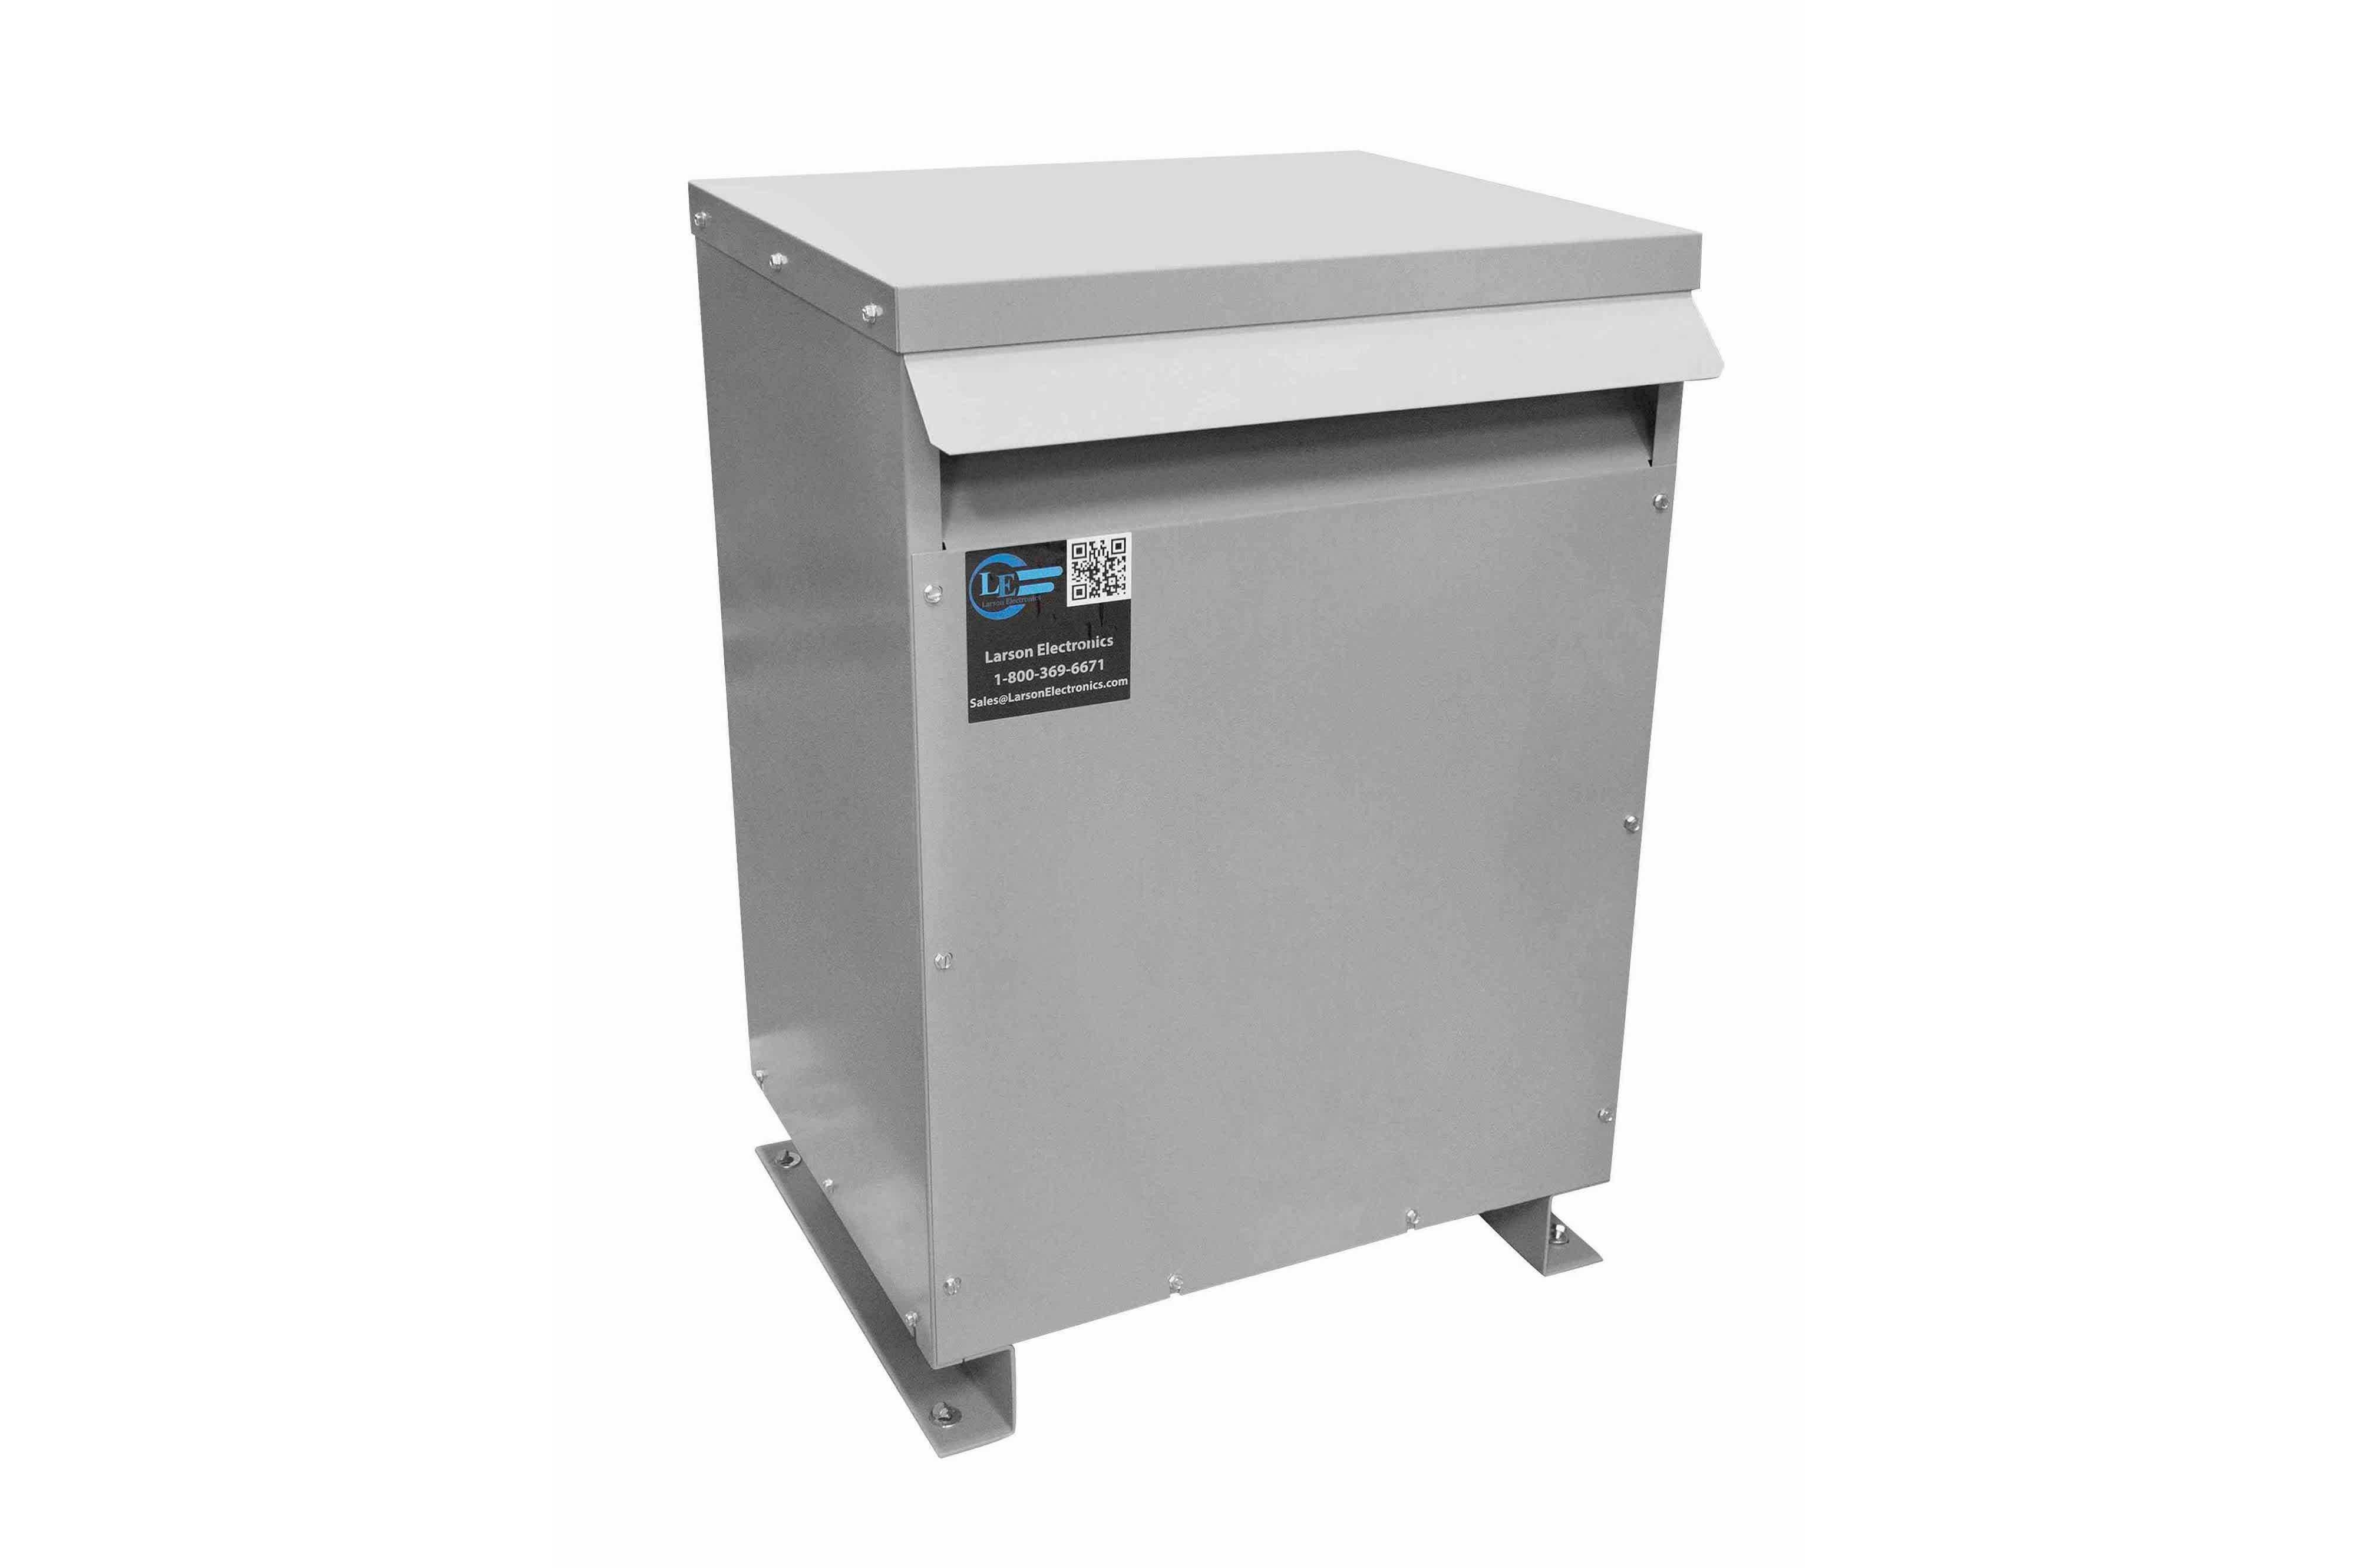 175 kVA 3PH Isolation Transformer, 480V Wye Primary, 575V Delta Secondary, N3R, Ventilated, 60 Hz